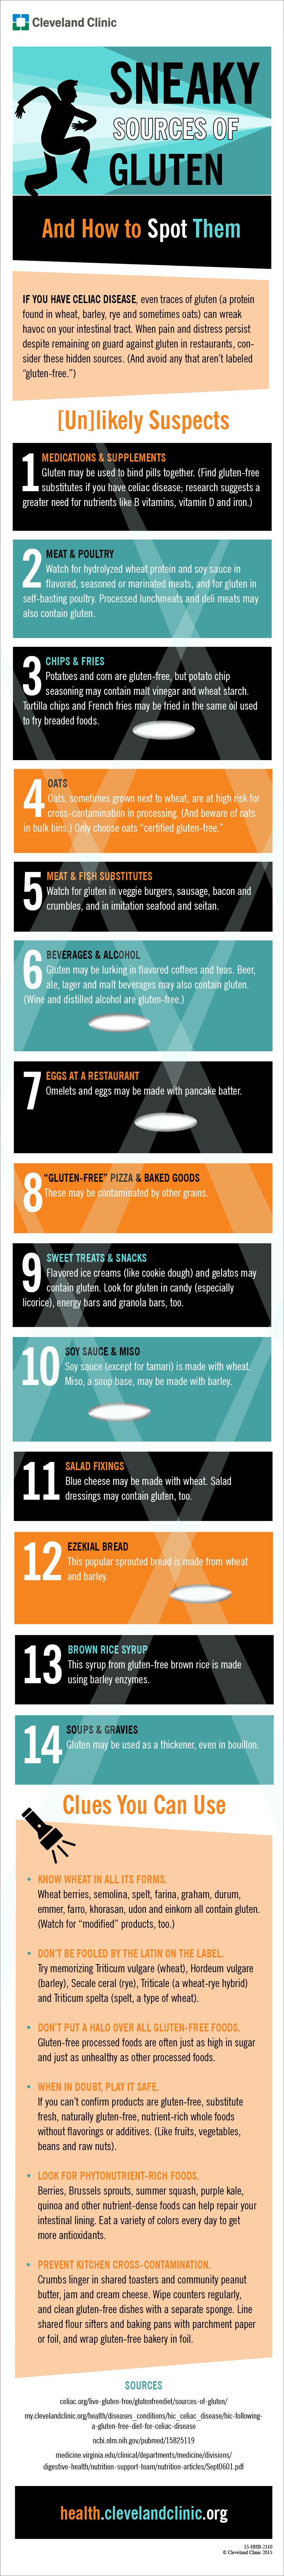 15-HHB-2110-Hidden-Gluten-Sources-Infographic_09.11.2015_FINAL.jpg